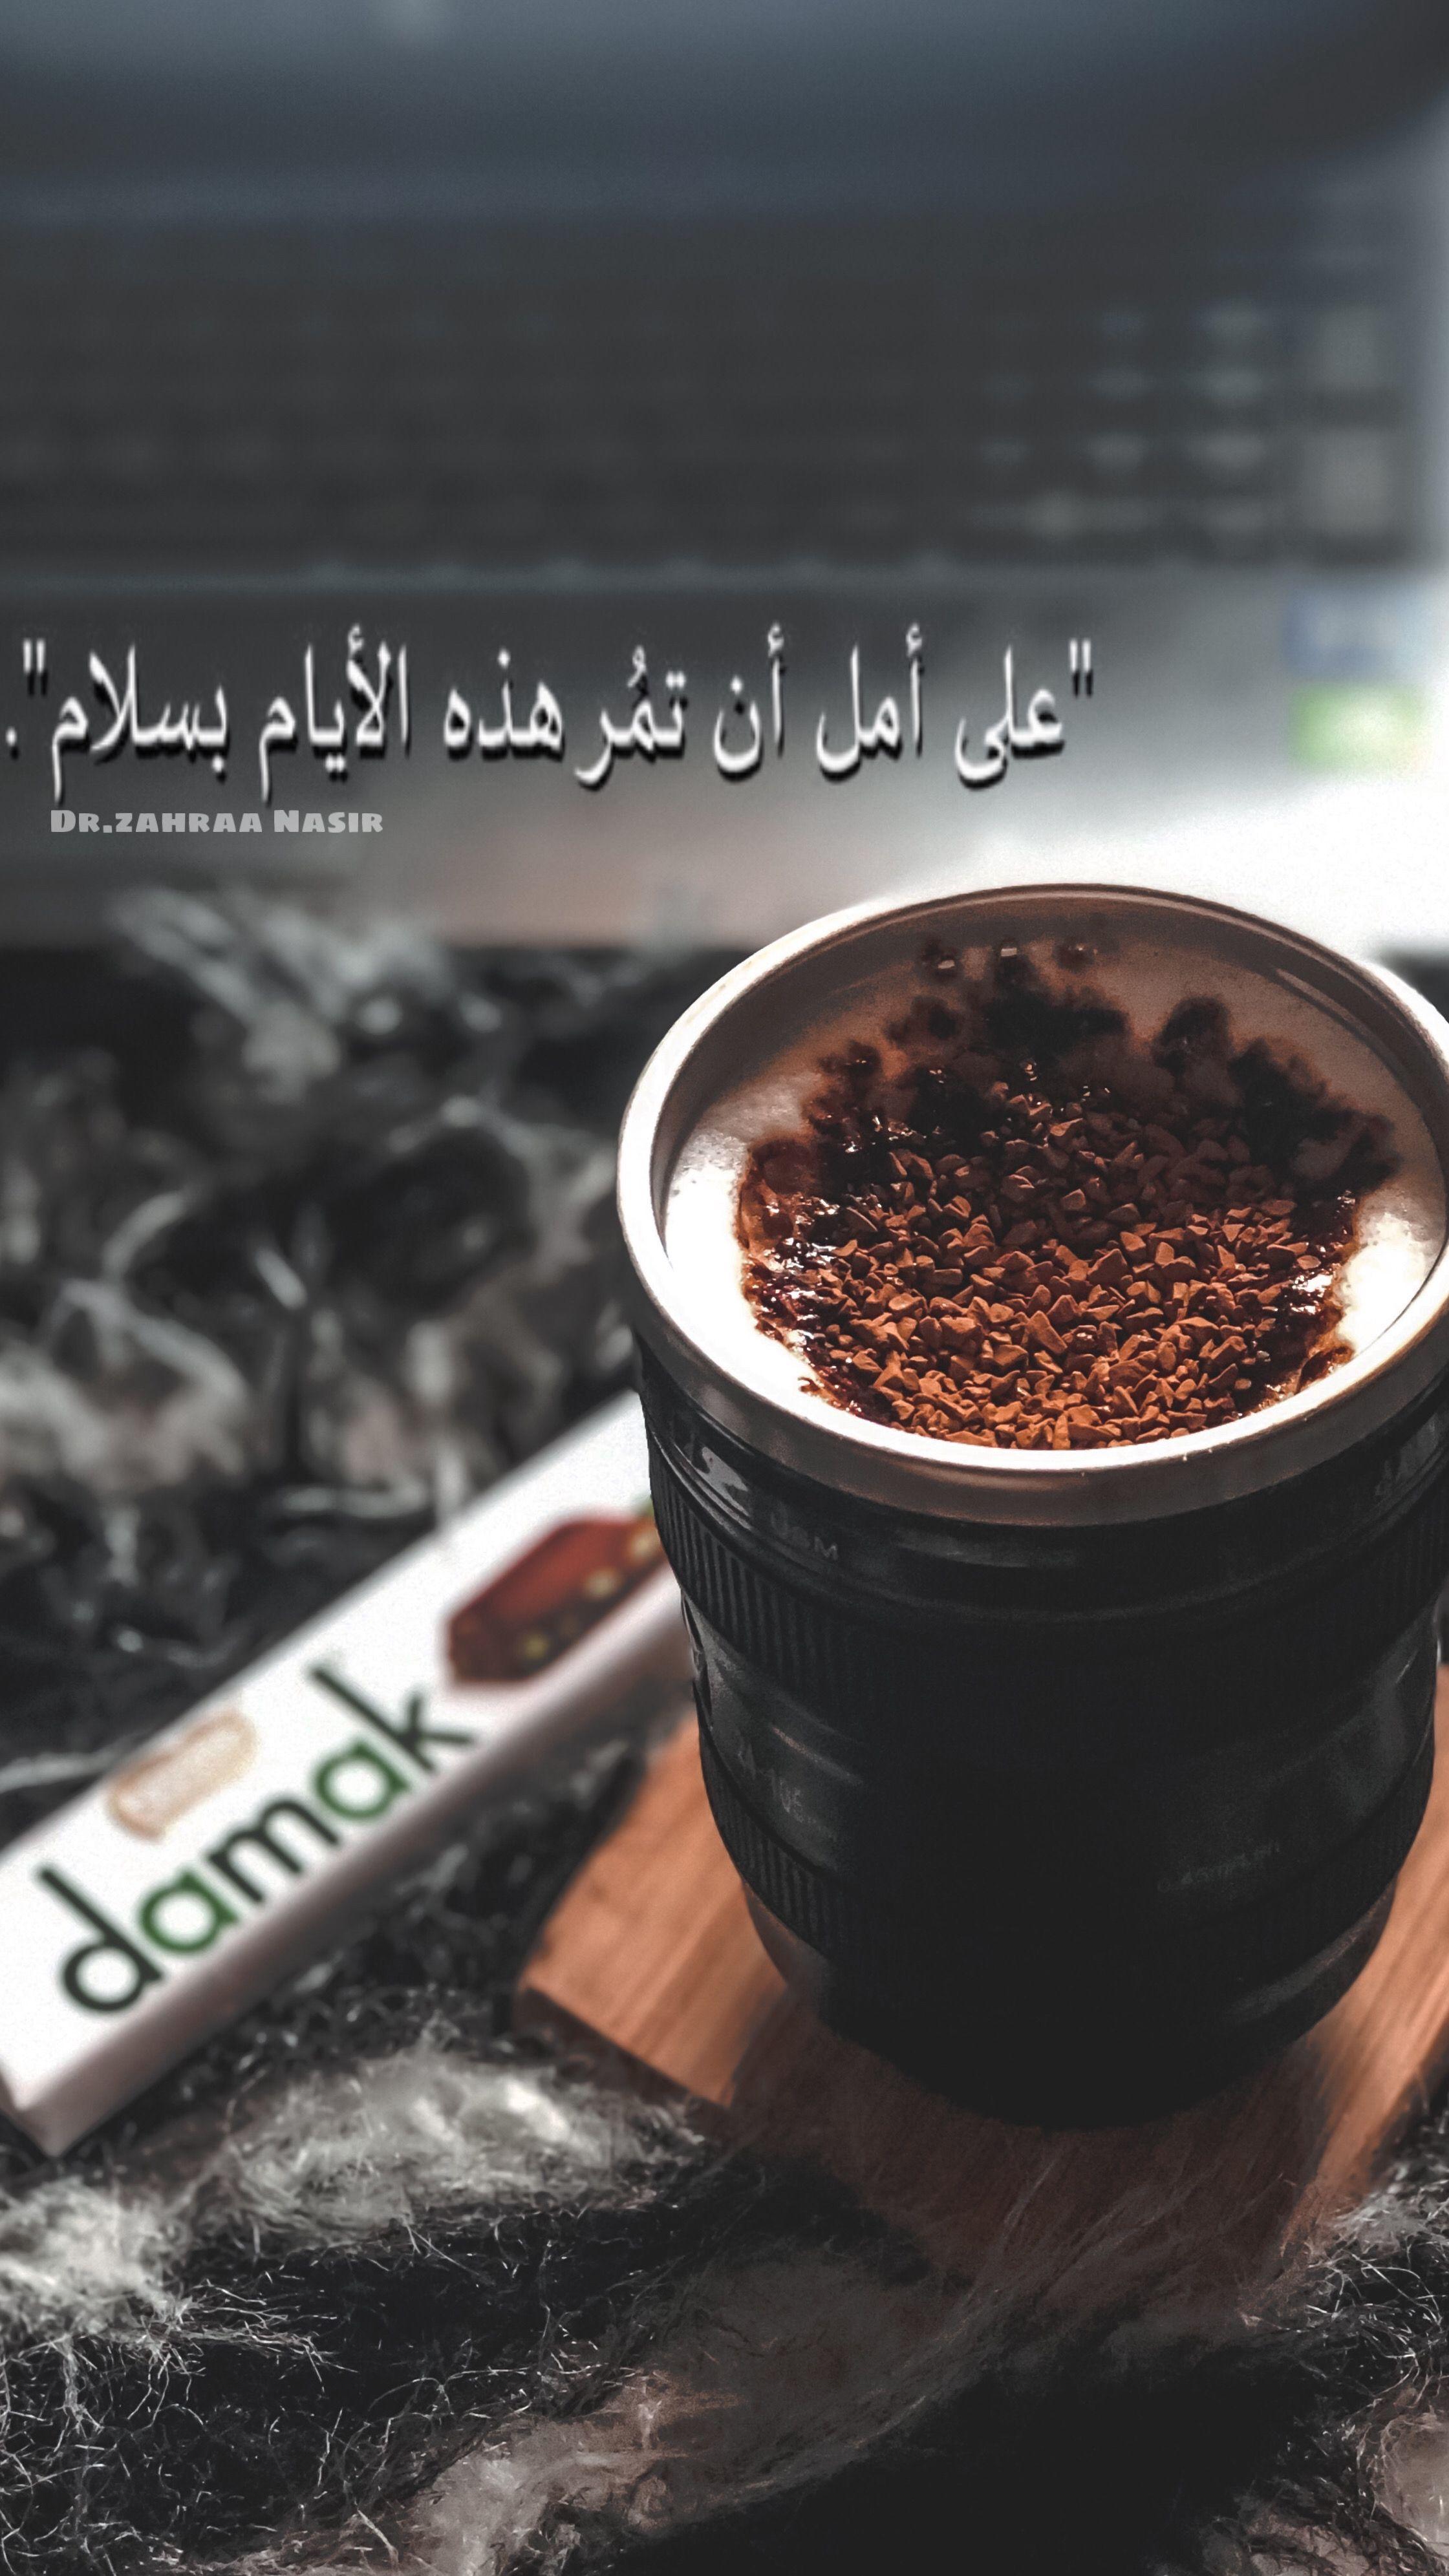 Pin By Zahraa Nasir On عبارات للتصوير Coffee Coffee Maker Pdf Books Download